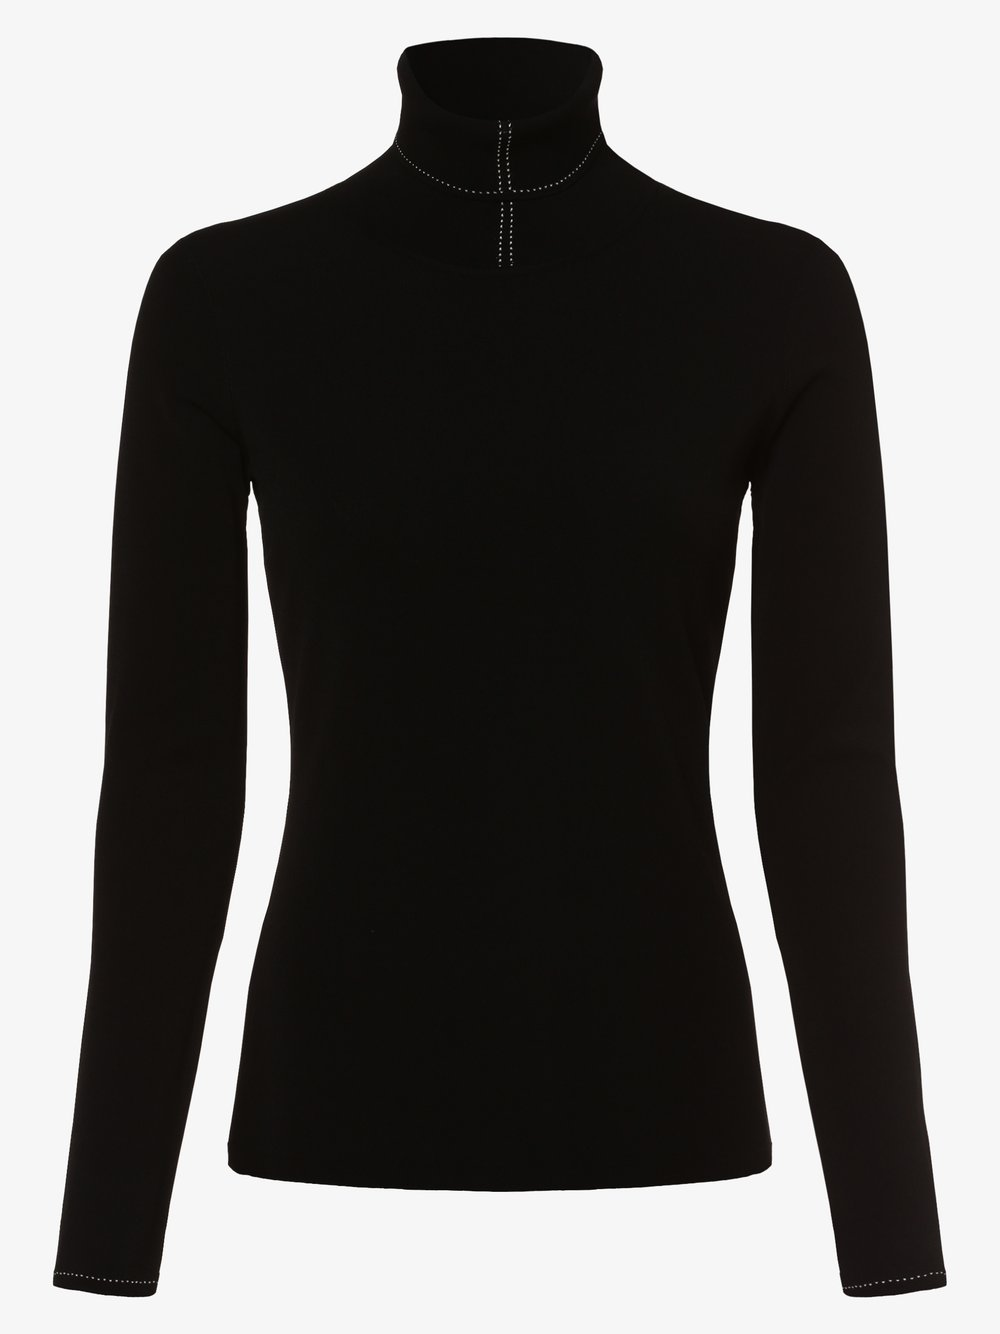 Marc Cain Collections – Damska koszulka z długim rękawem, czarny Van Graaf 440522-0001-00400